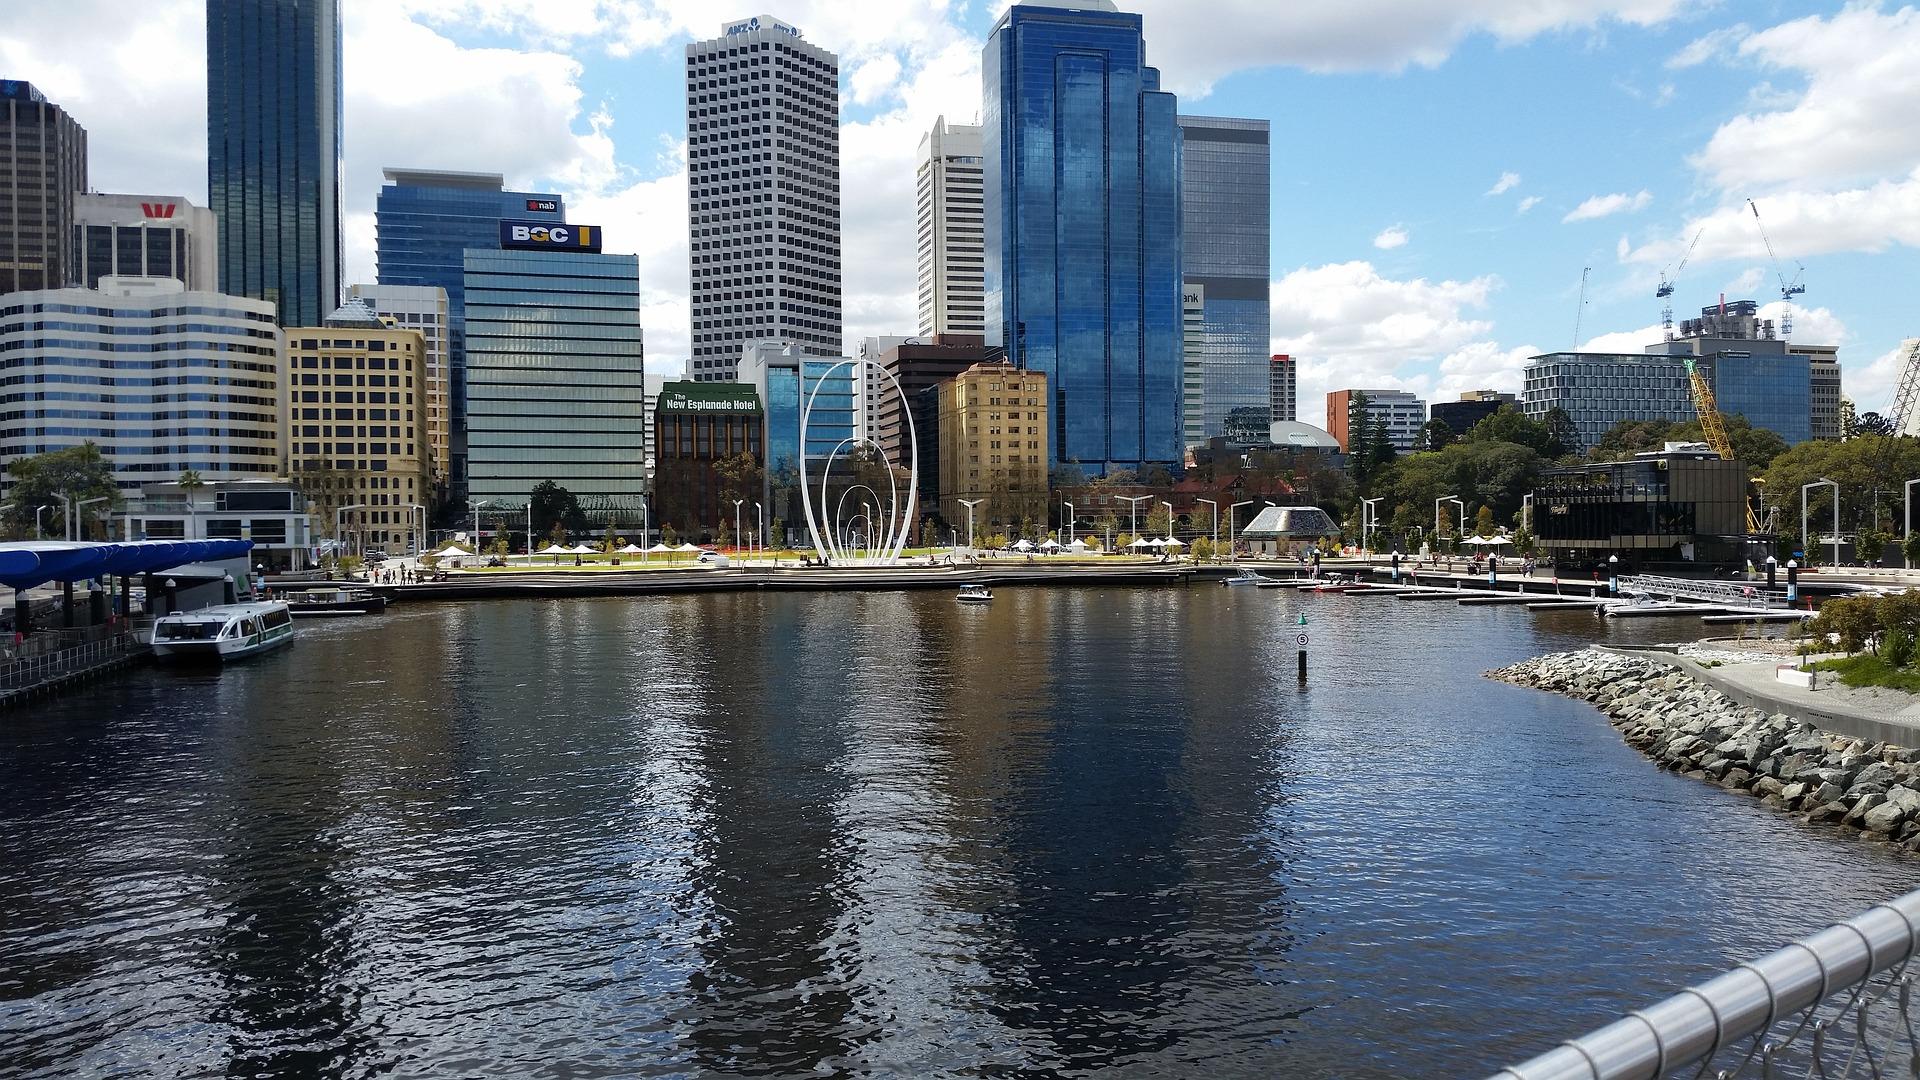 Western Australia Photo Gallery — travelwildnow.com